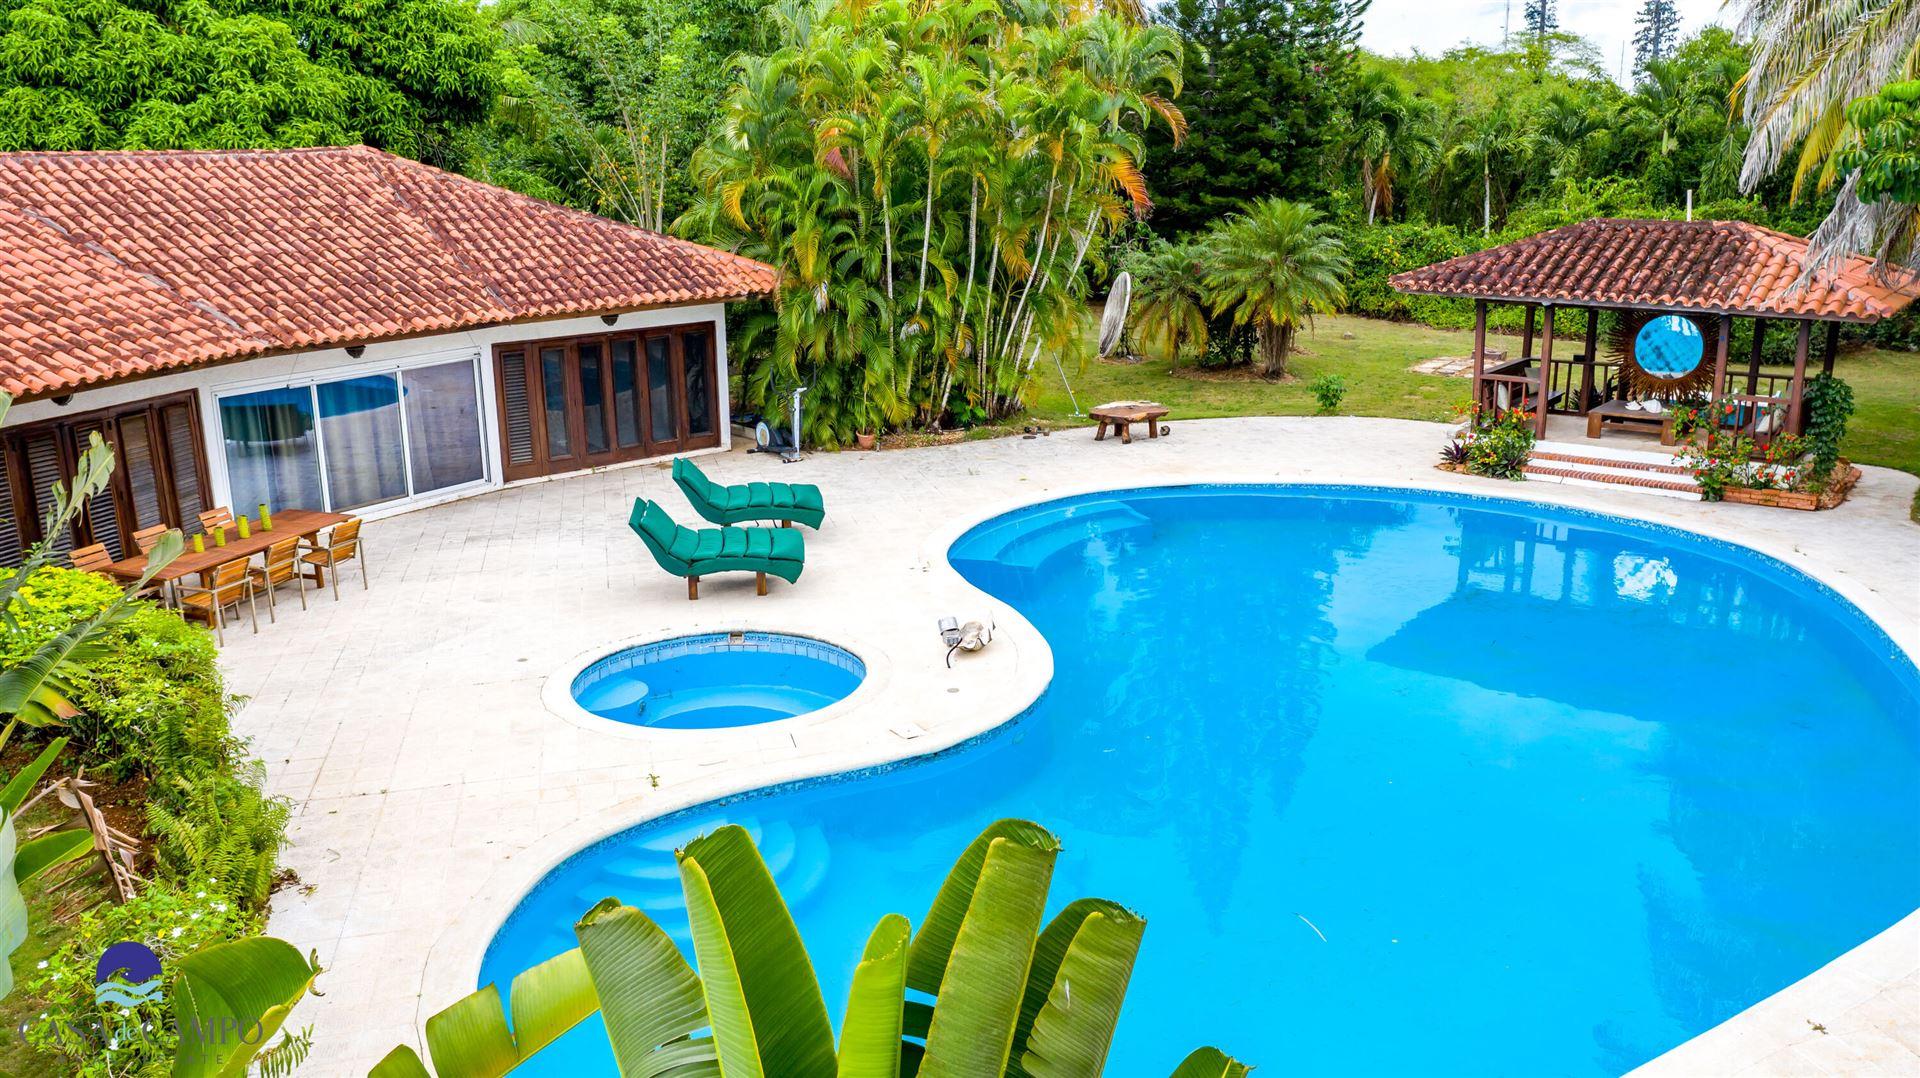 32 Barranca, Casa de Campo,  22000 - MLS#: RX-10745596